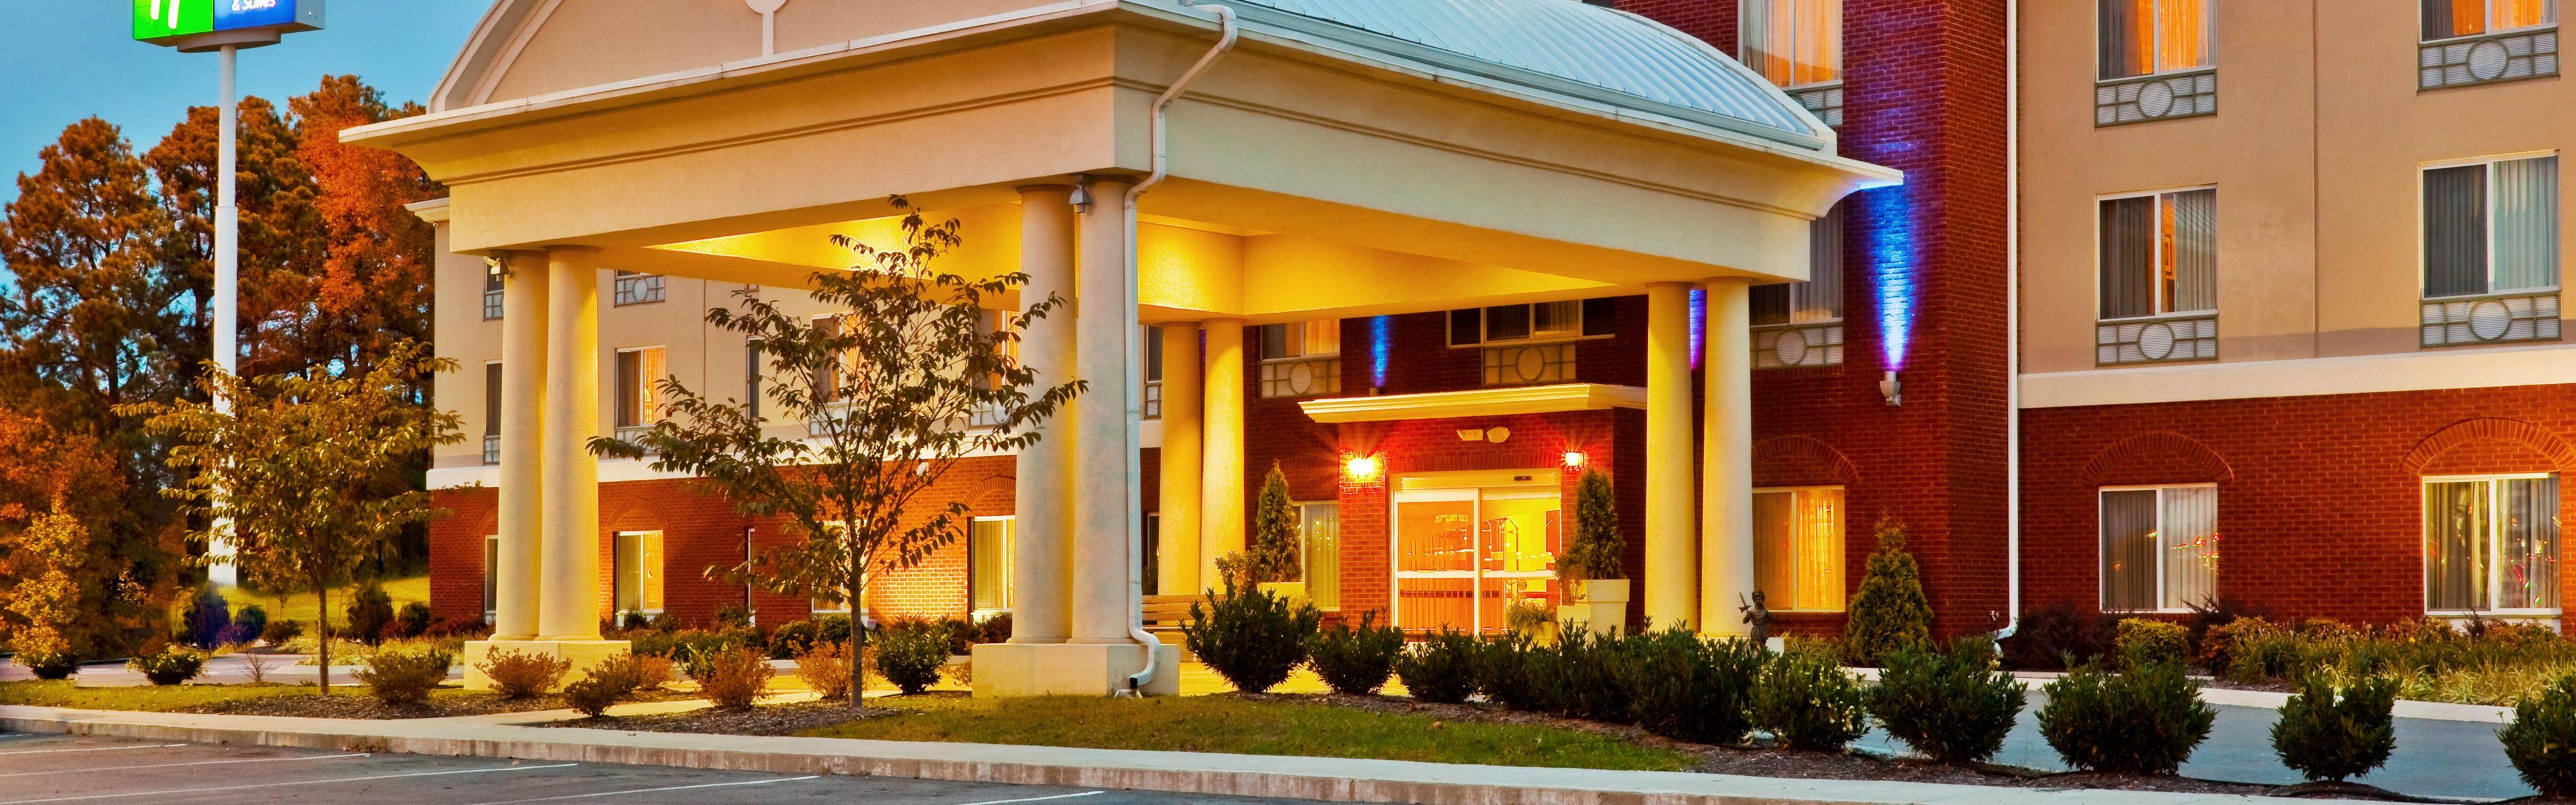 Holiday Inn Express Dickson image 0